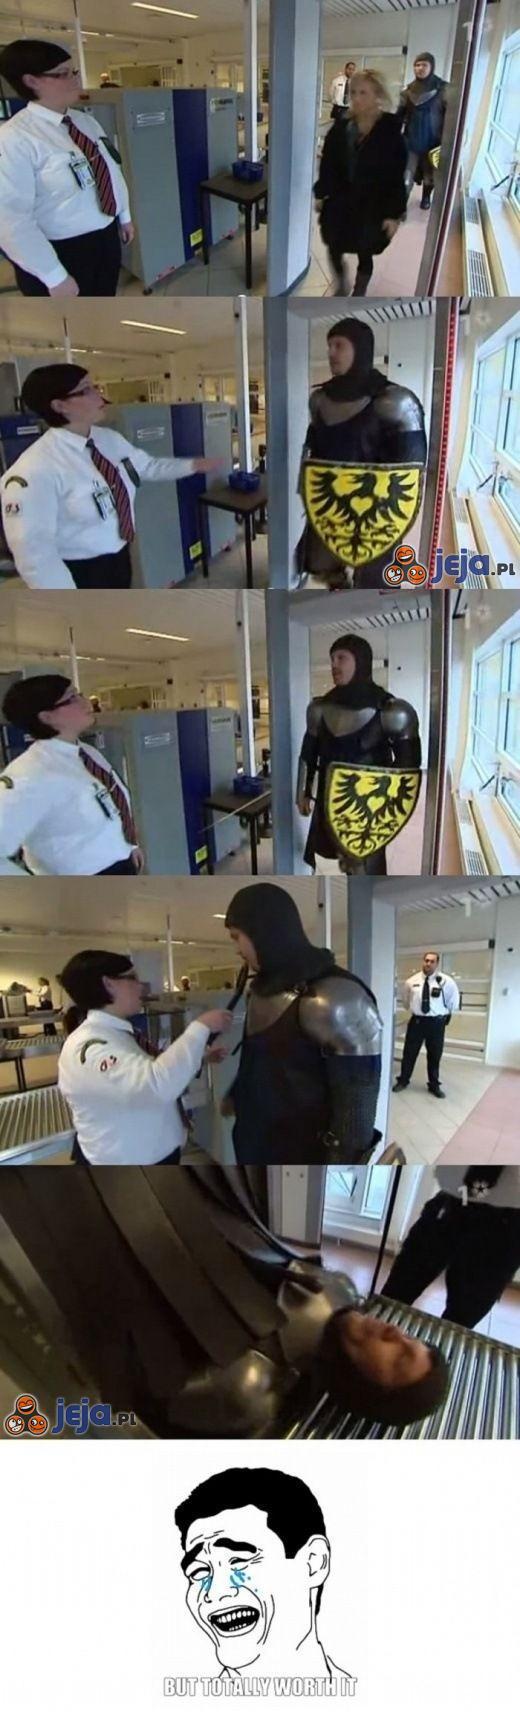 Rycerz trolluje na lotnisku